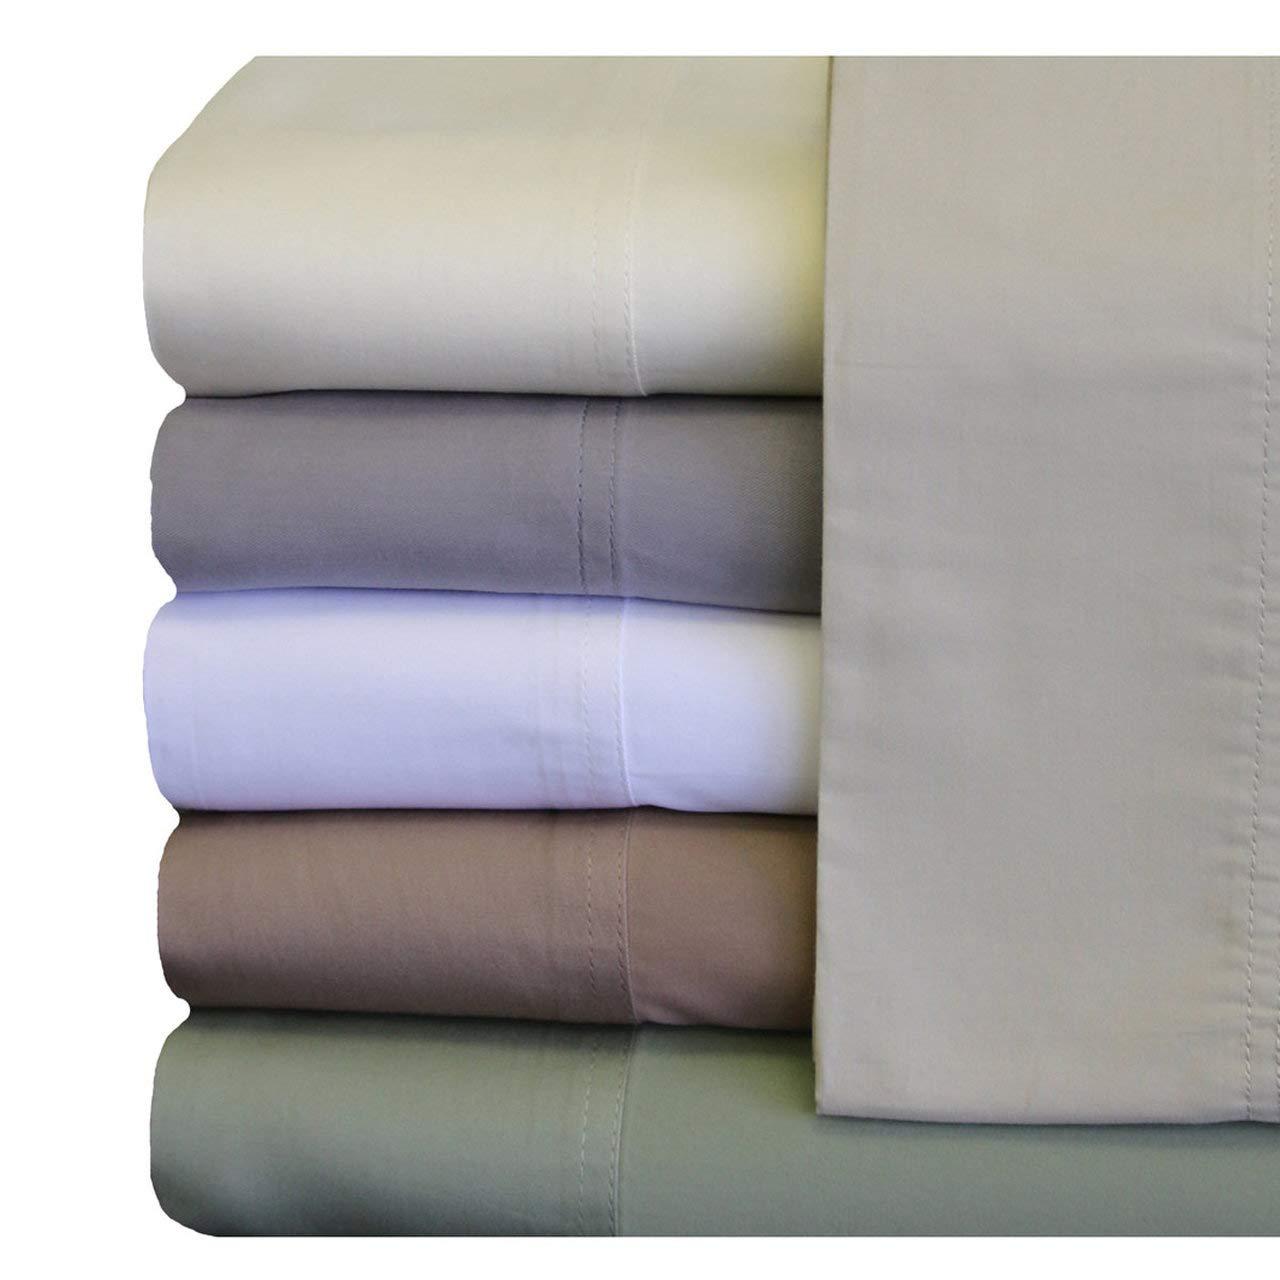 ABRIPEDIC TENCEL SHEETS, Silky Soft and Naturally Pure Fabric, 100% Woven Tencel Lyocell Sheet Set